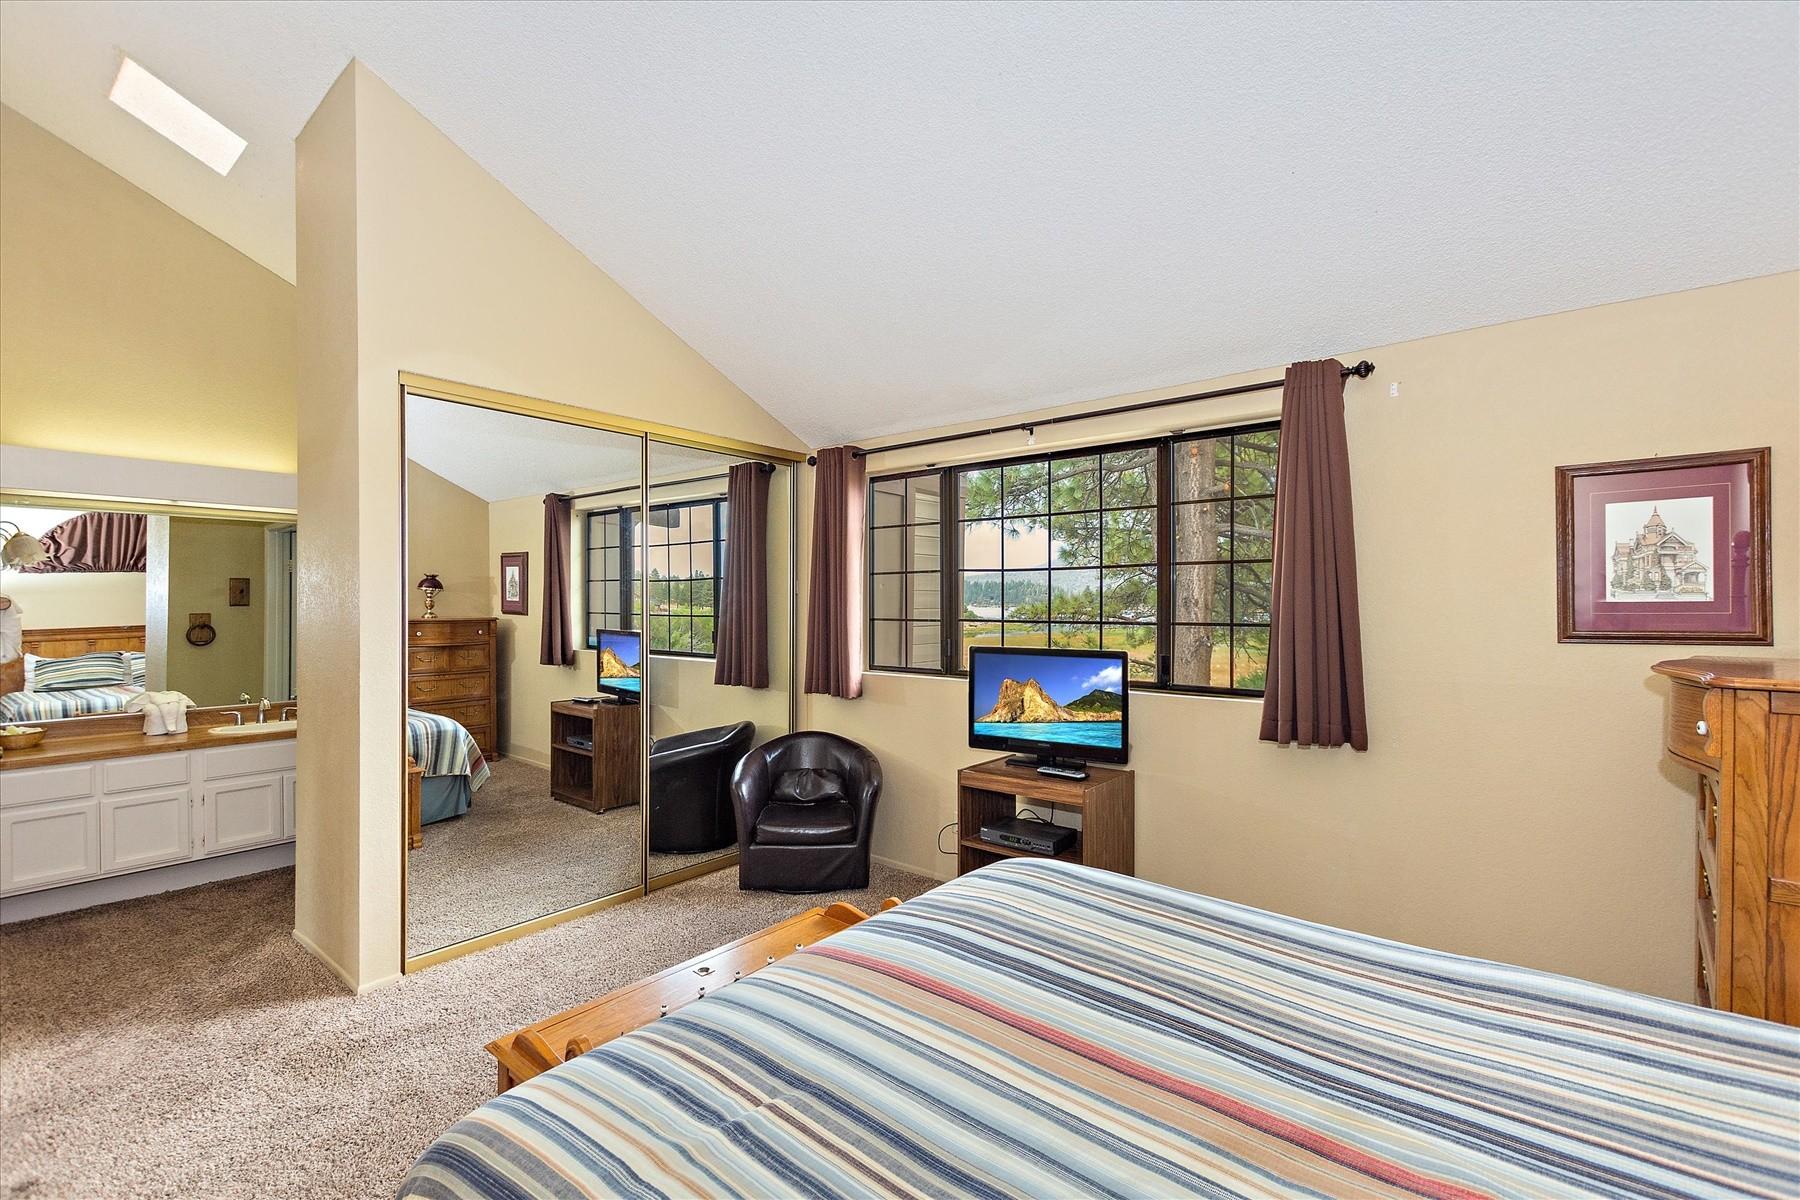 Additional photo for property listing at 675 Cienega Road #C Big Bear Lake, CA 92315 675 Cienega Road Unit #C, Big Bear Lake, Californie 92315 États-Unis